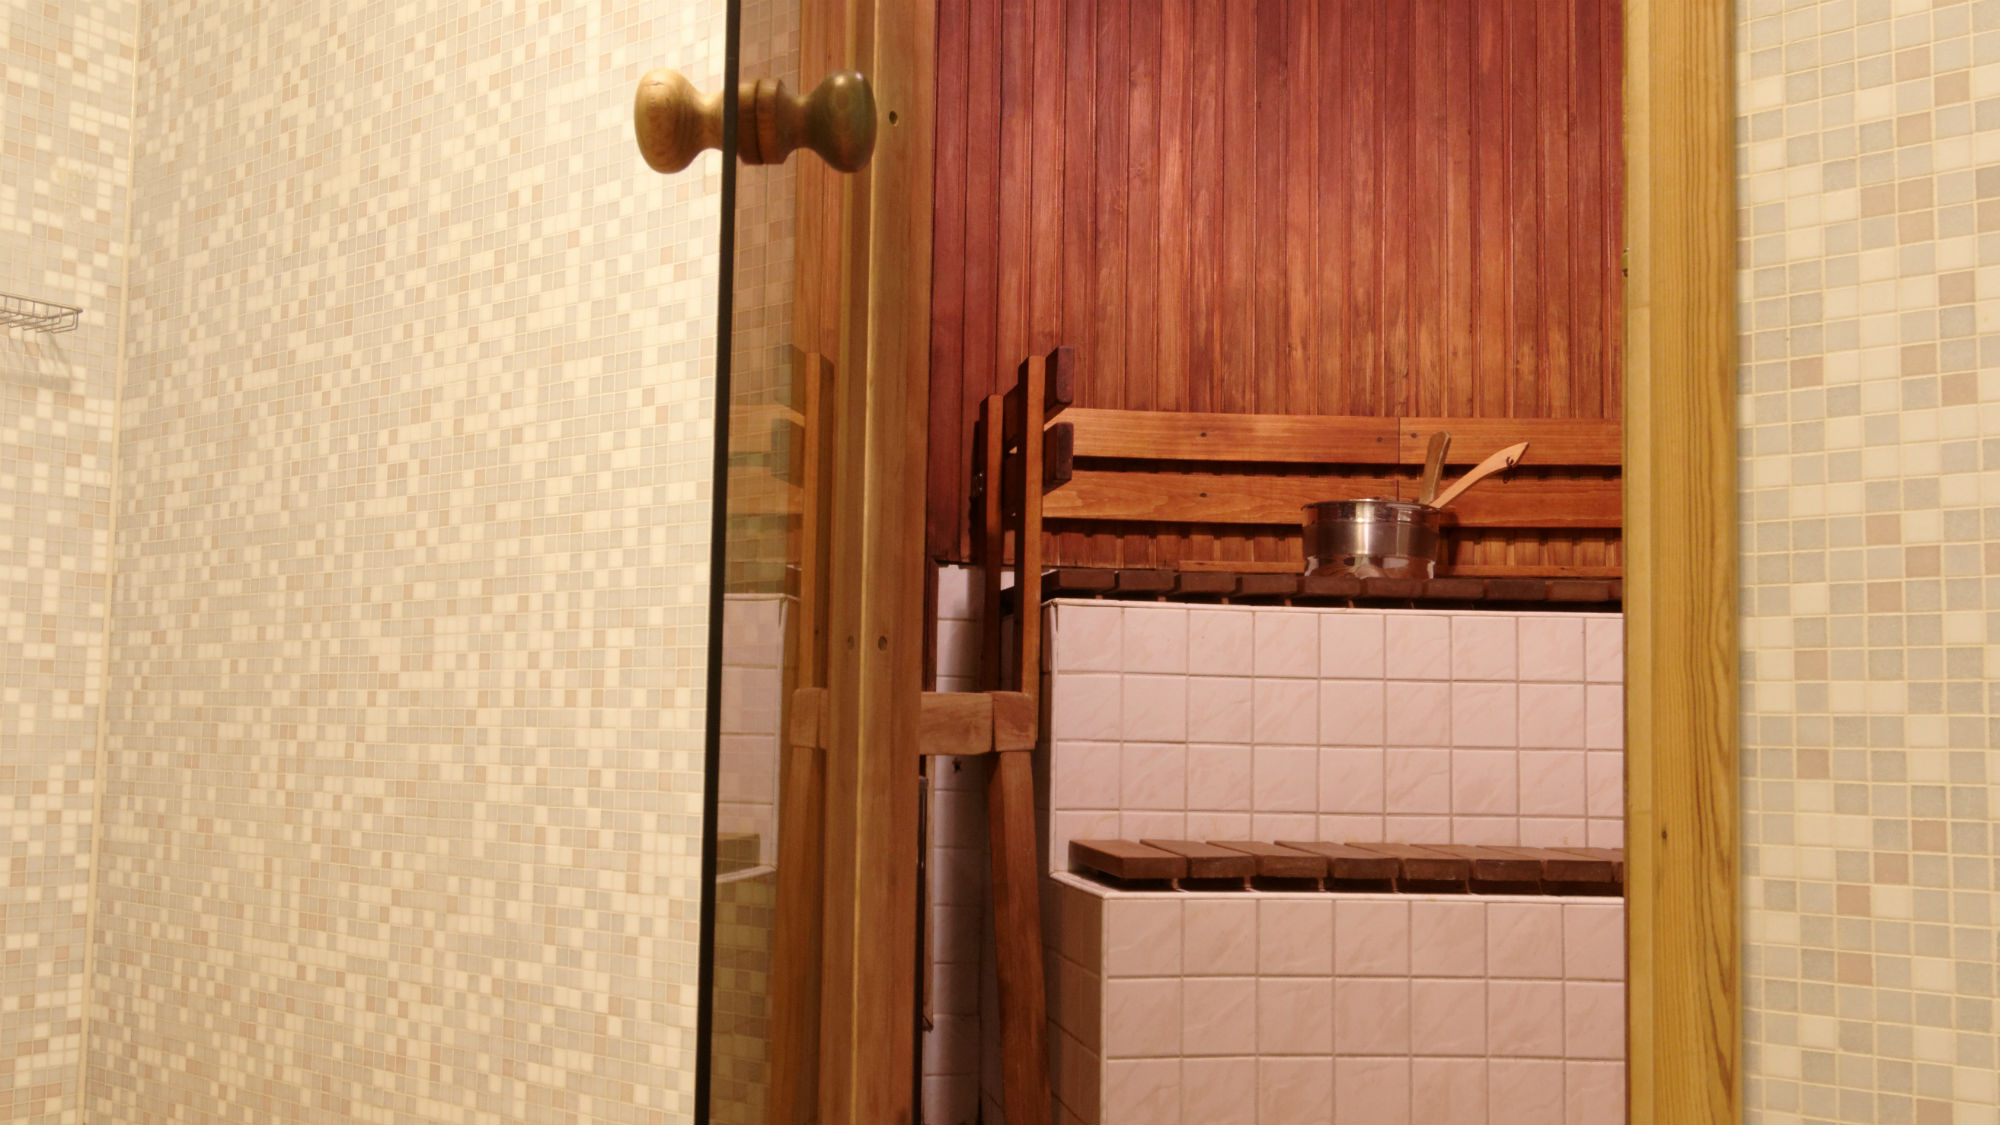 spa tallinn old town i my city hotel sauna and jacuzzi. Black Bedroom Furniture Sets. Home Design Ideas